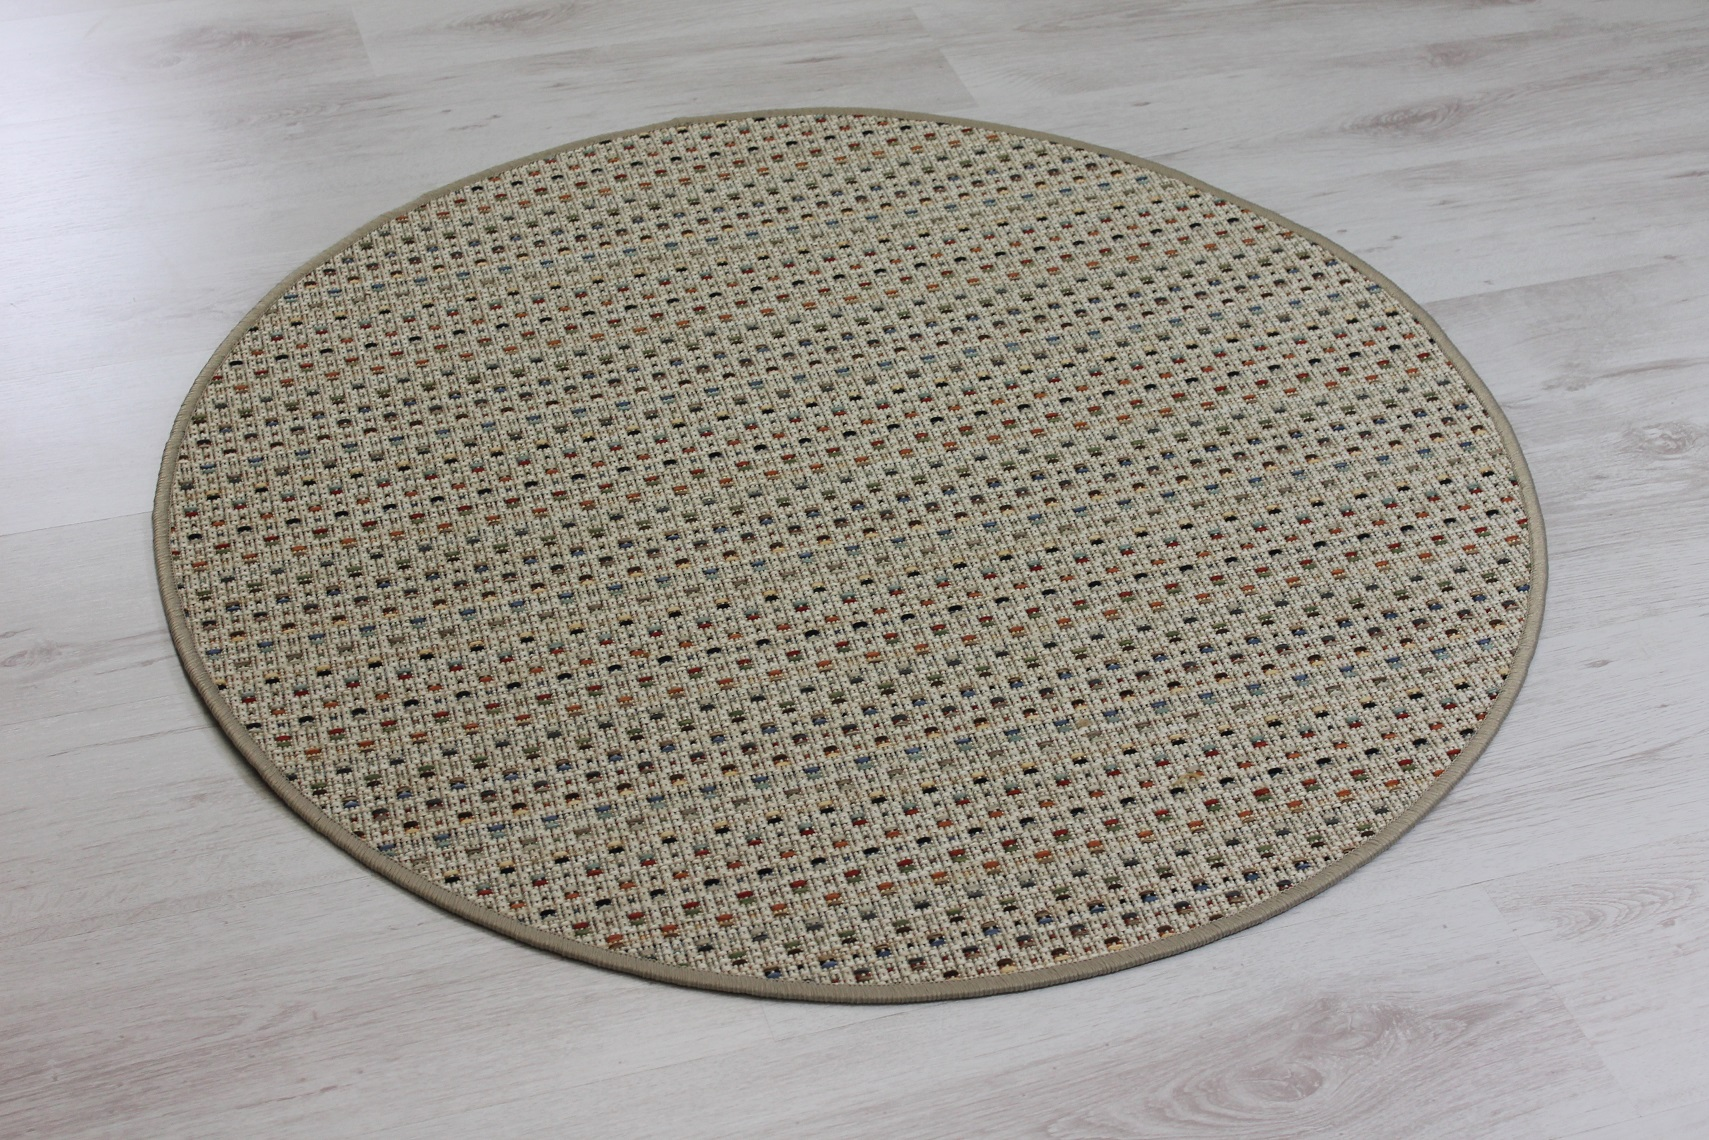 teppichkiste olympus beige sisal optik teppich bunt gemustert rund musterfarbe 20. Black Bedroom Furniture Sets. Home Design Ideas